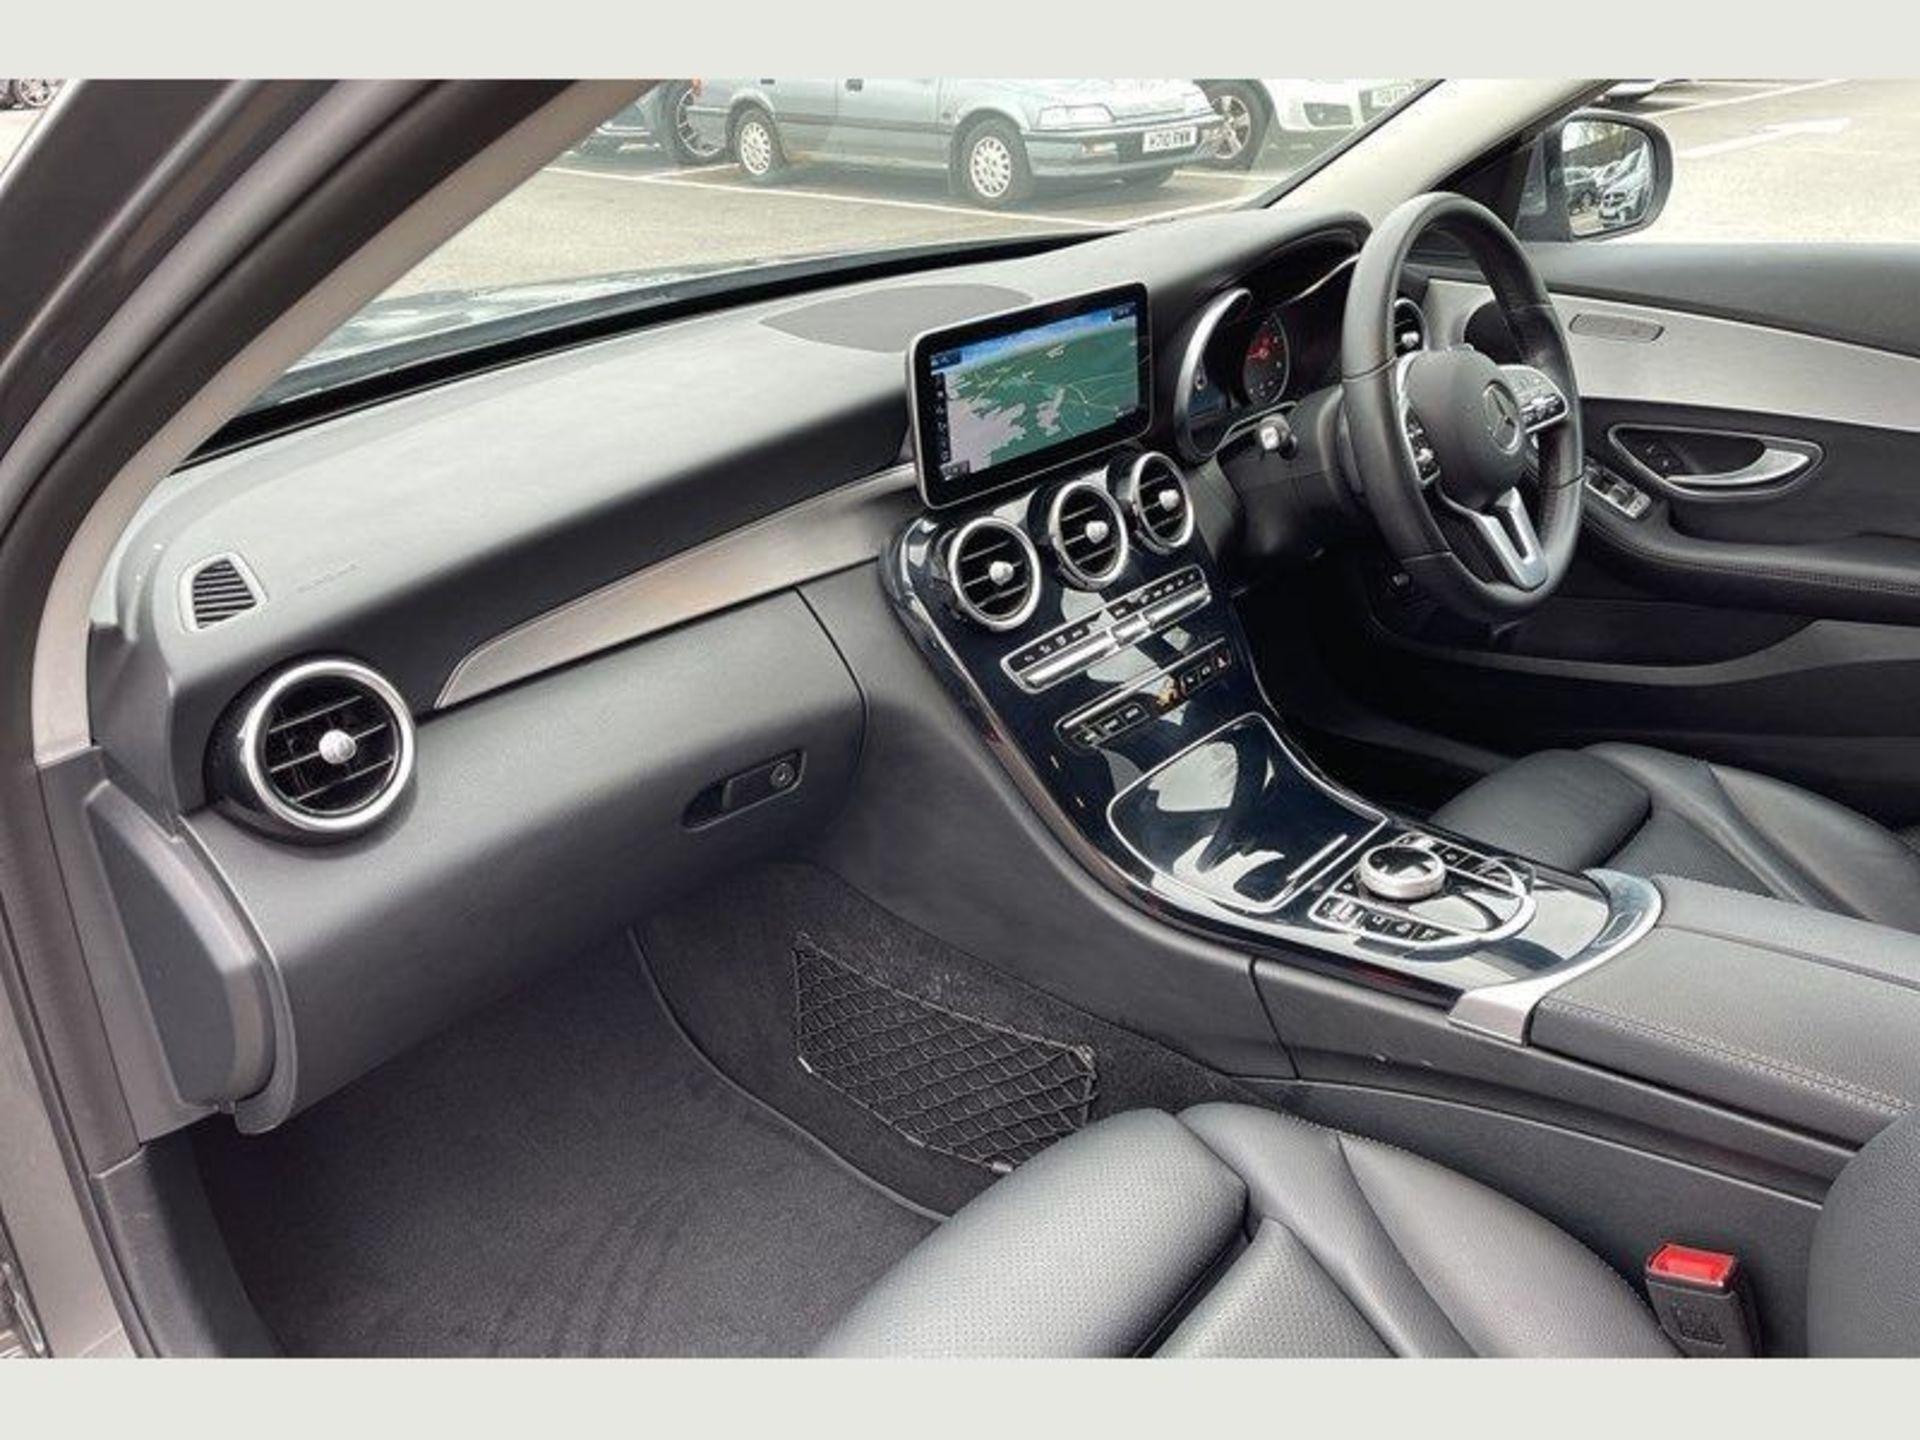 (Reserve Met) Mercedes C220d Sport - 9G Tronic Auto - 188BHP - 2019 Reg - Reversing Cam - Sat Nav - - Image 4 of 7